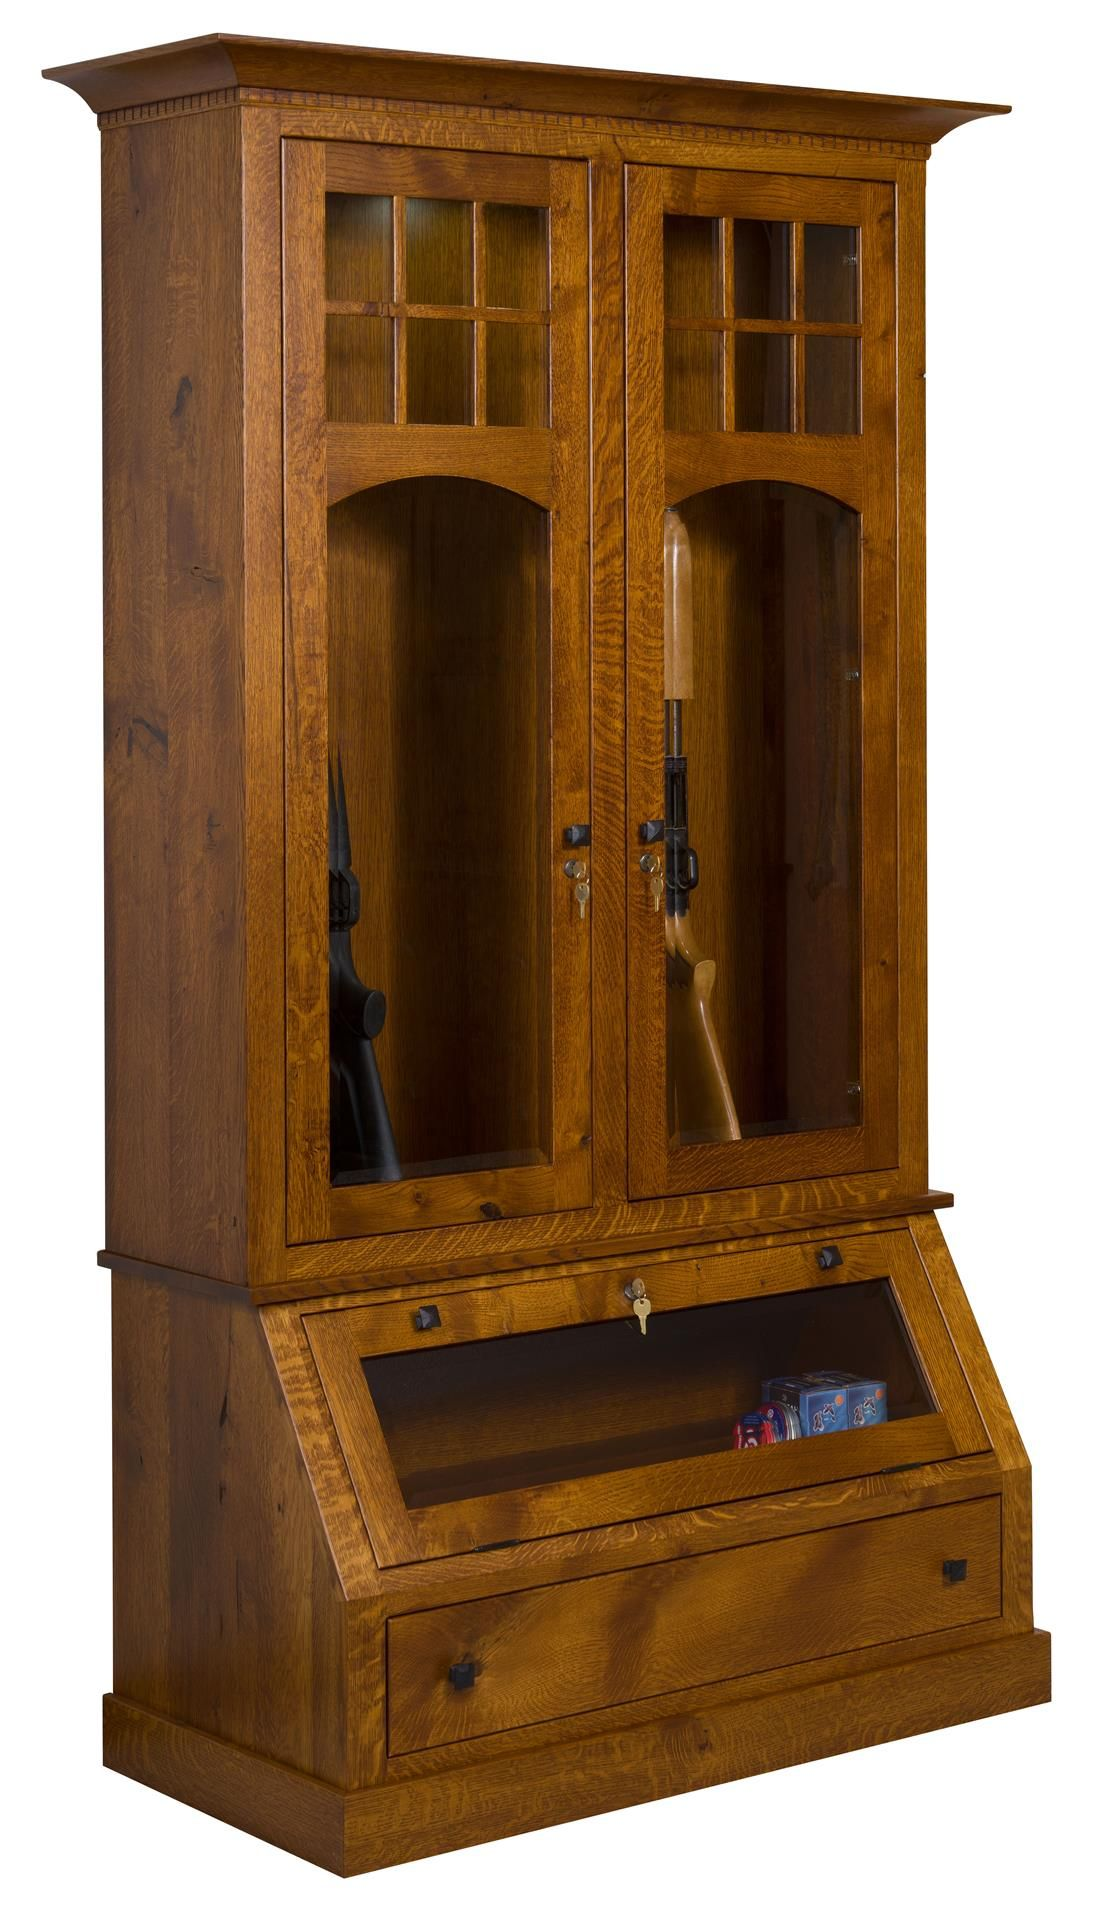 American Tribecca Gun Cabinet In 2019 Gun Cabinets